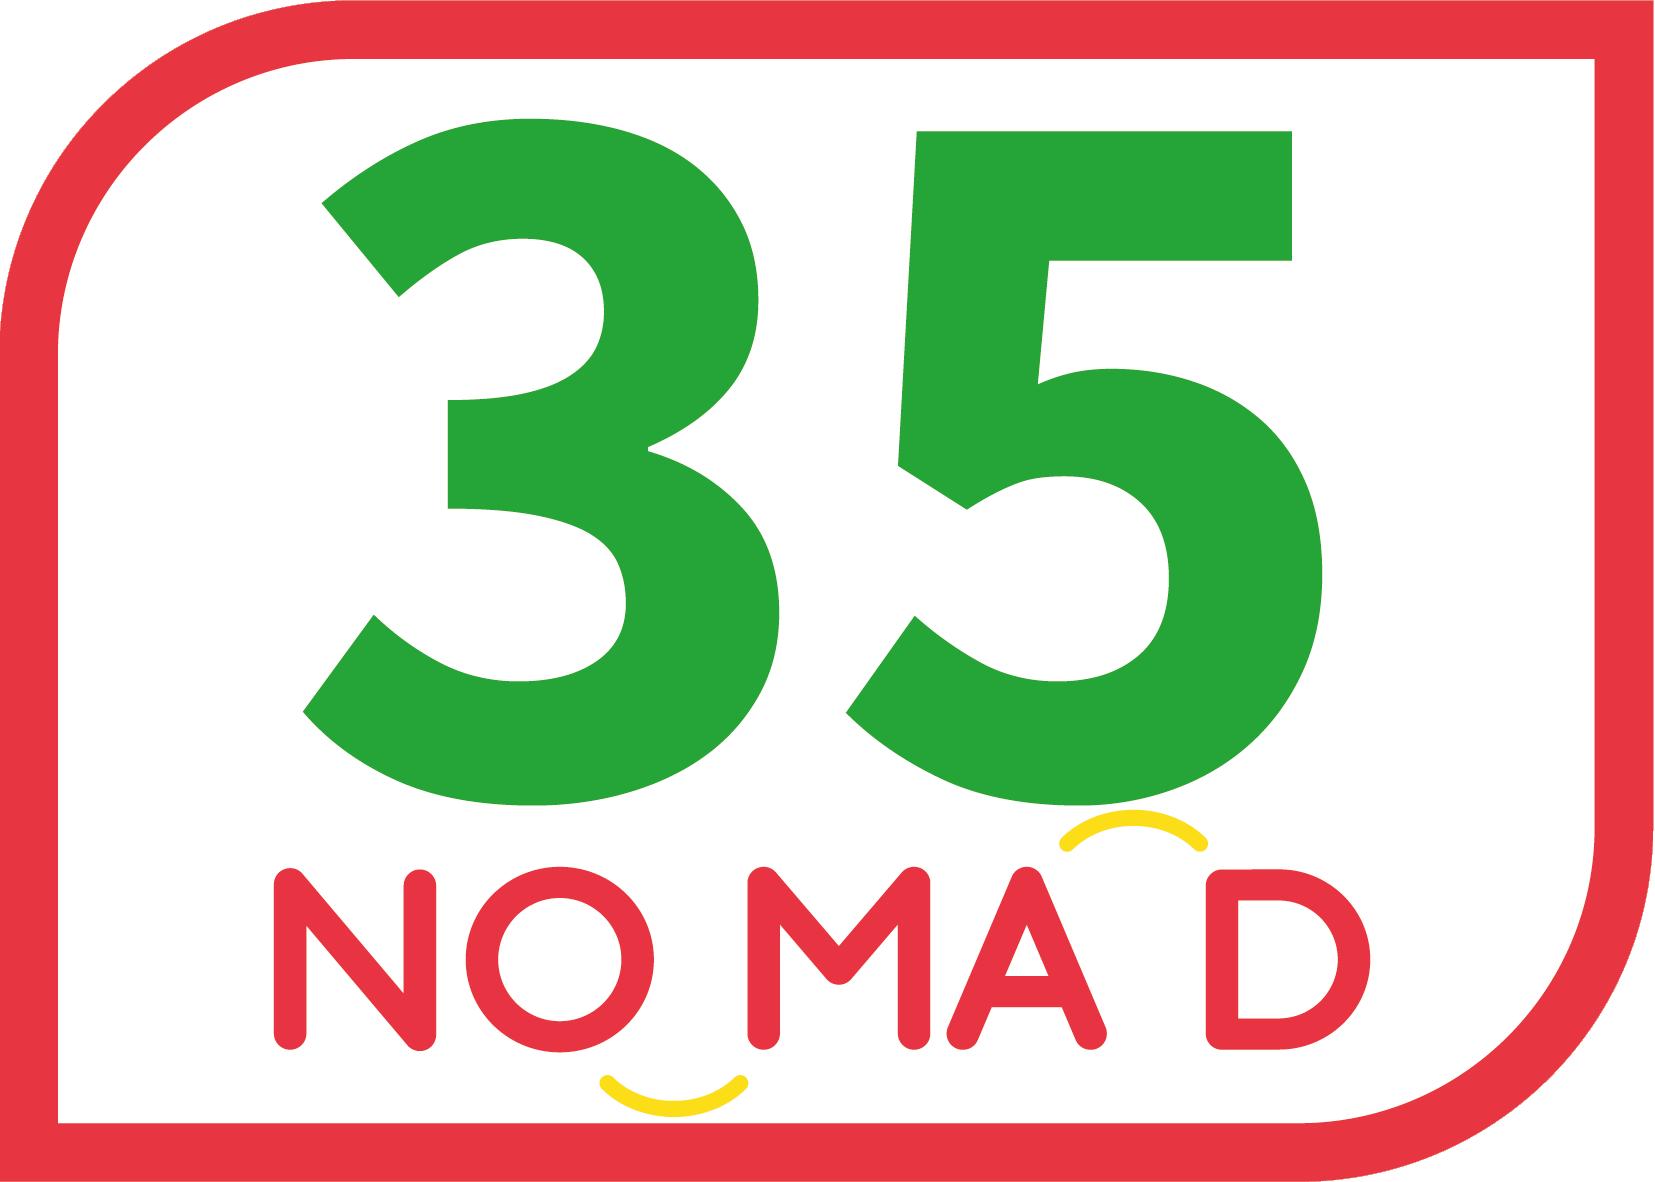 Ligne Nomad 35